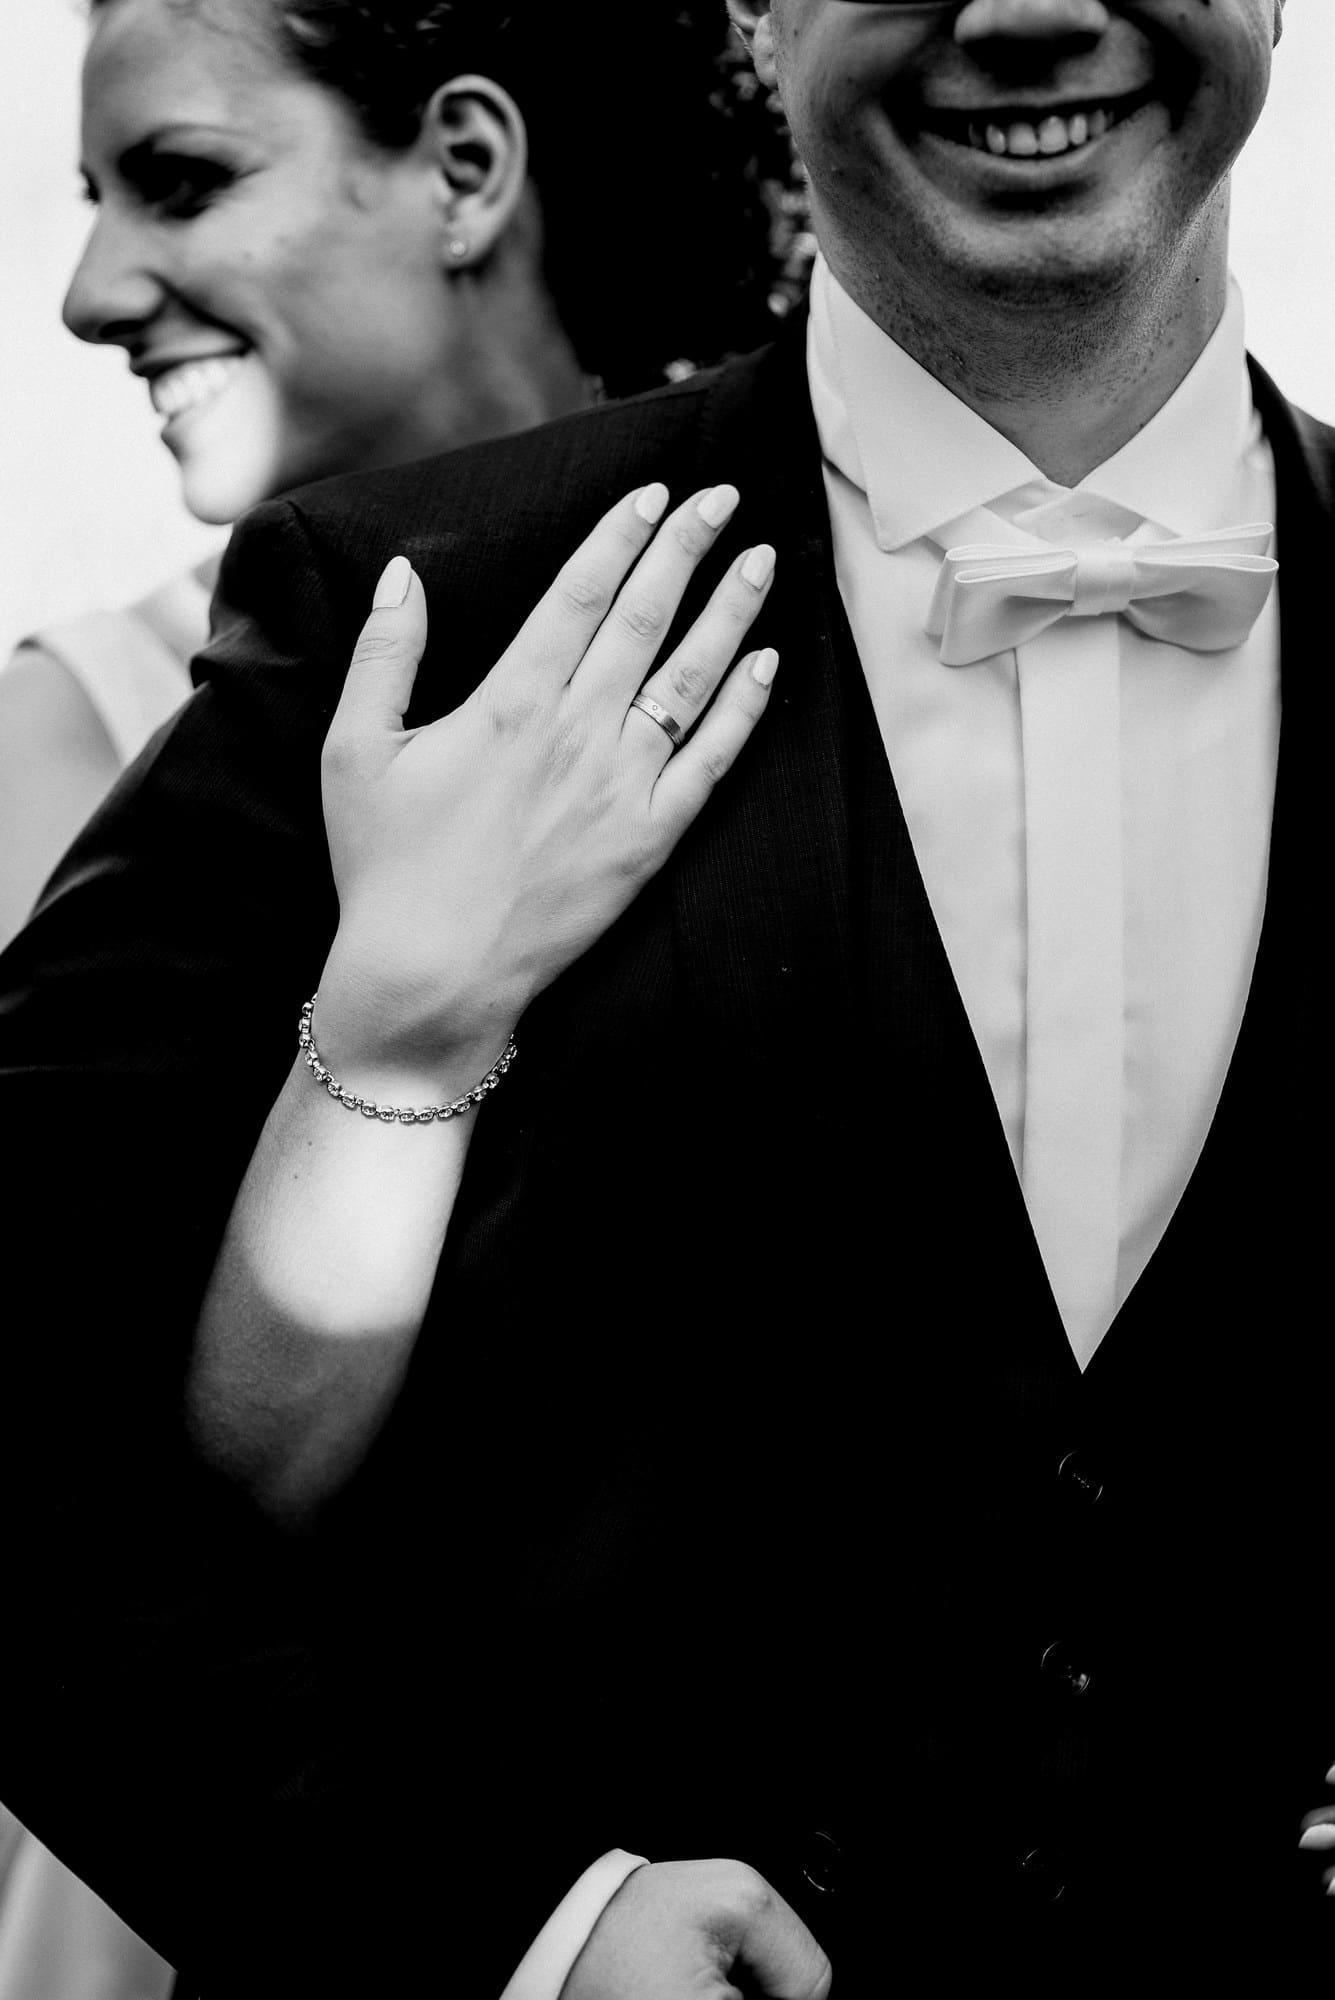 Ehering Armkette Hand Braut Bräutigam